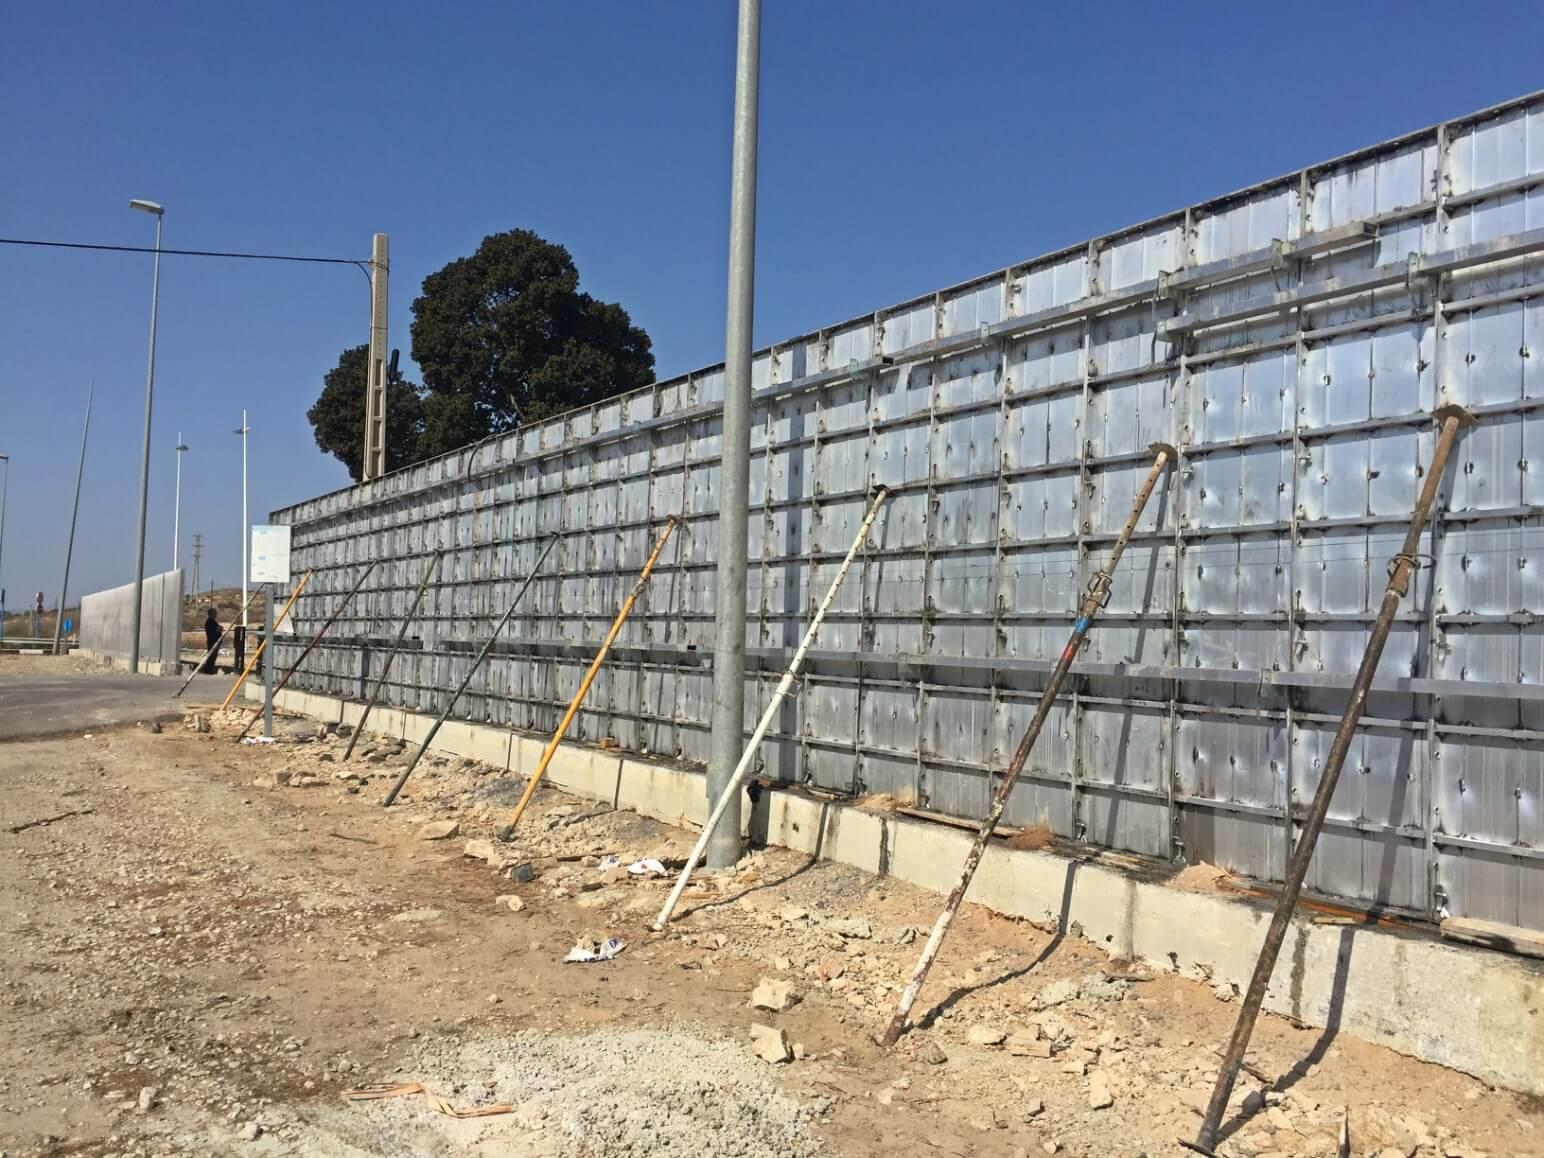 proyecto muro perimetral encofrados de aluminio construccion strong forms alicante 8